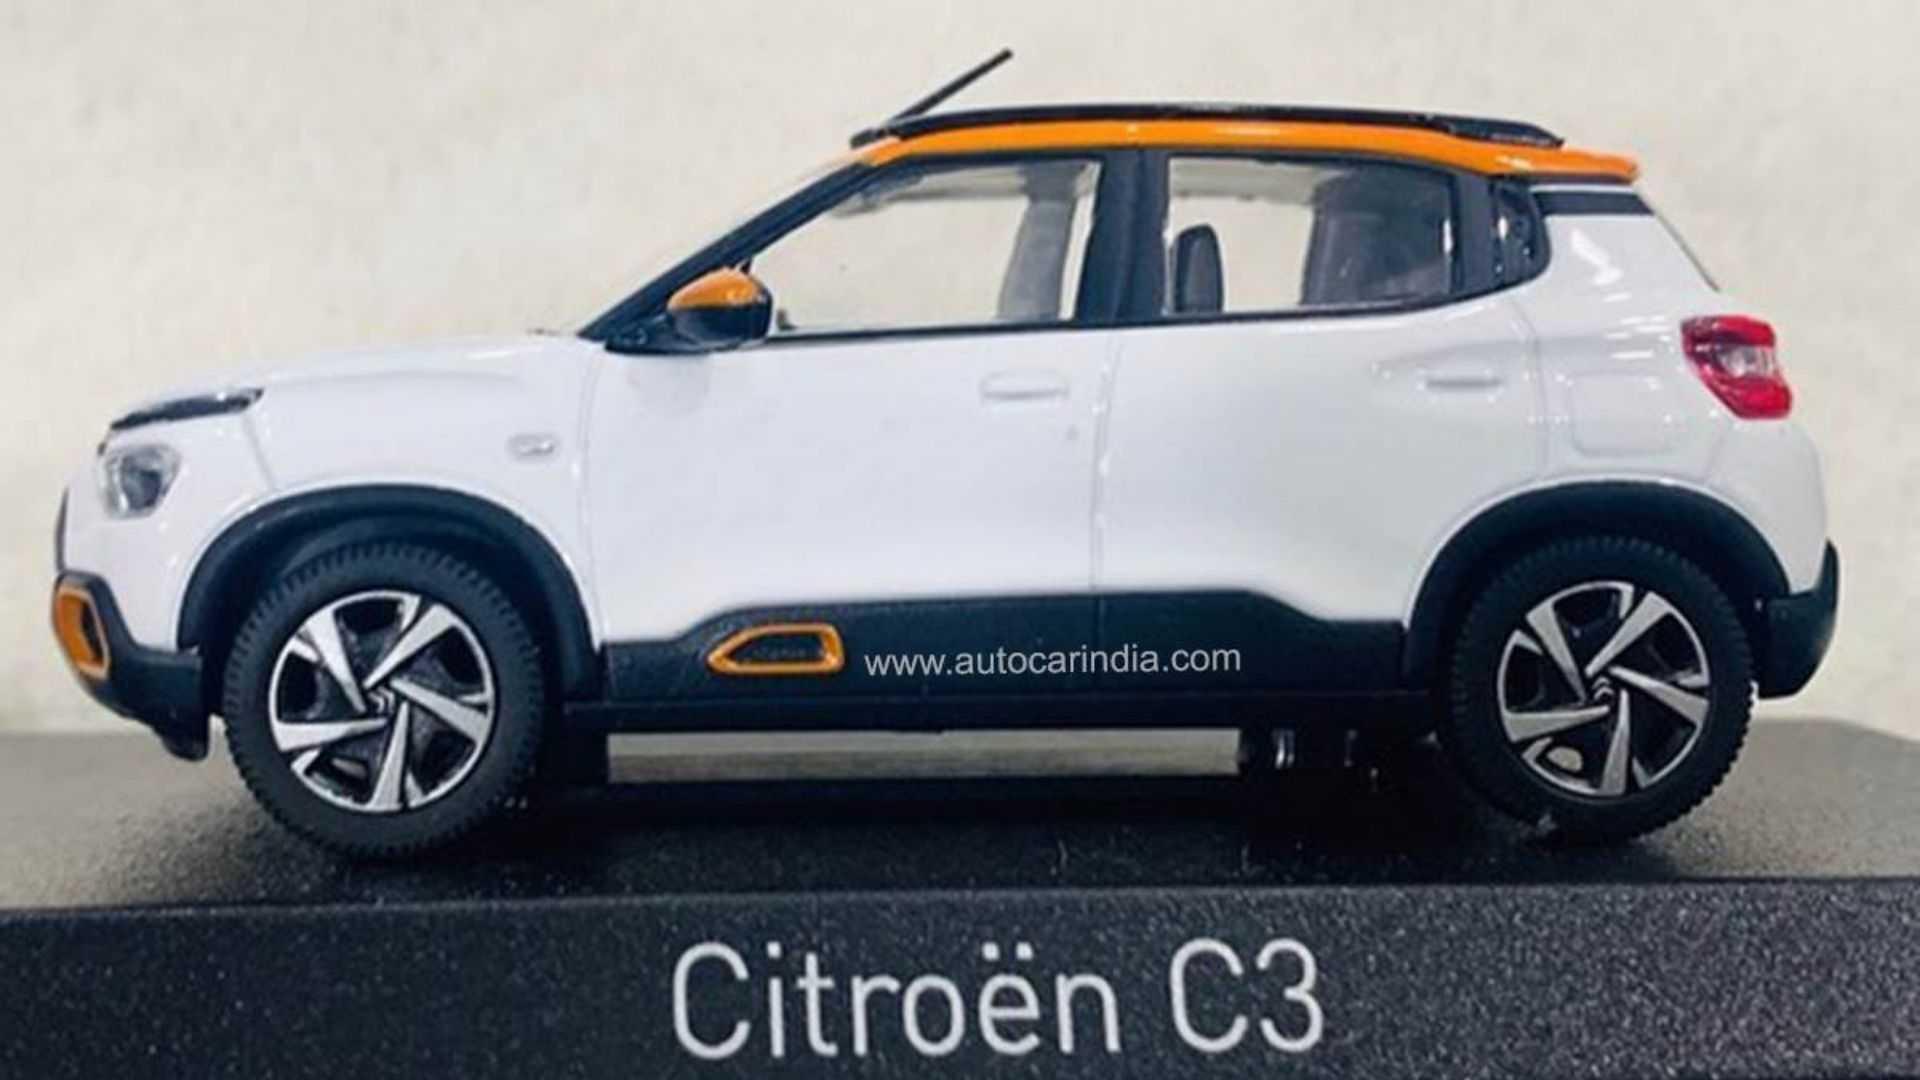 Novo Citroën C3 Autocar Índia